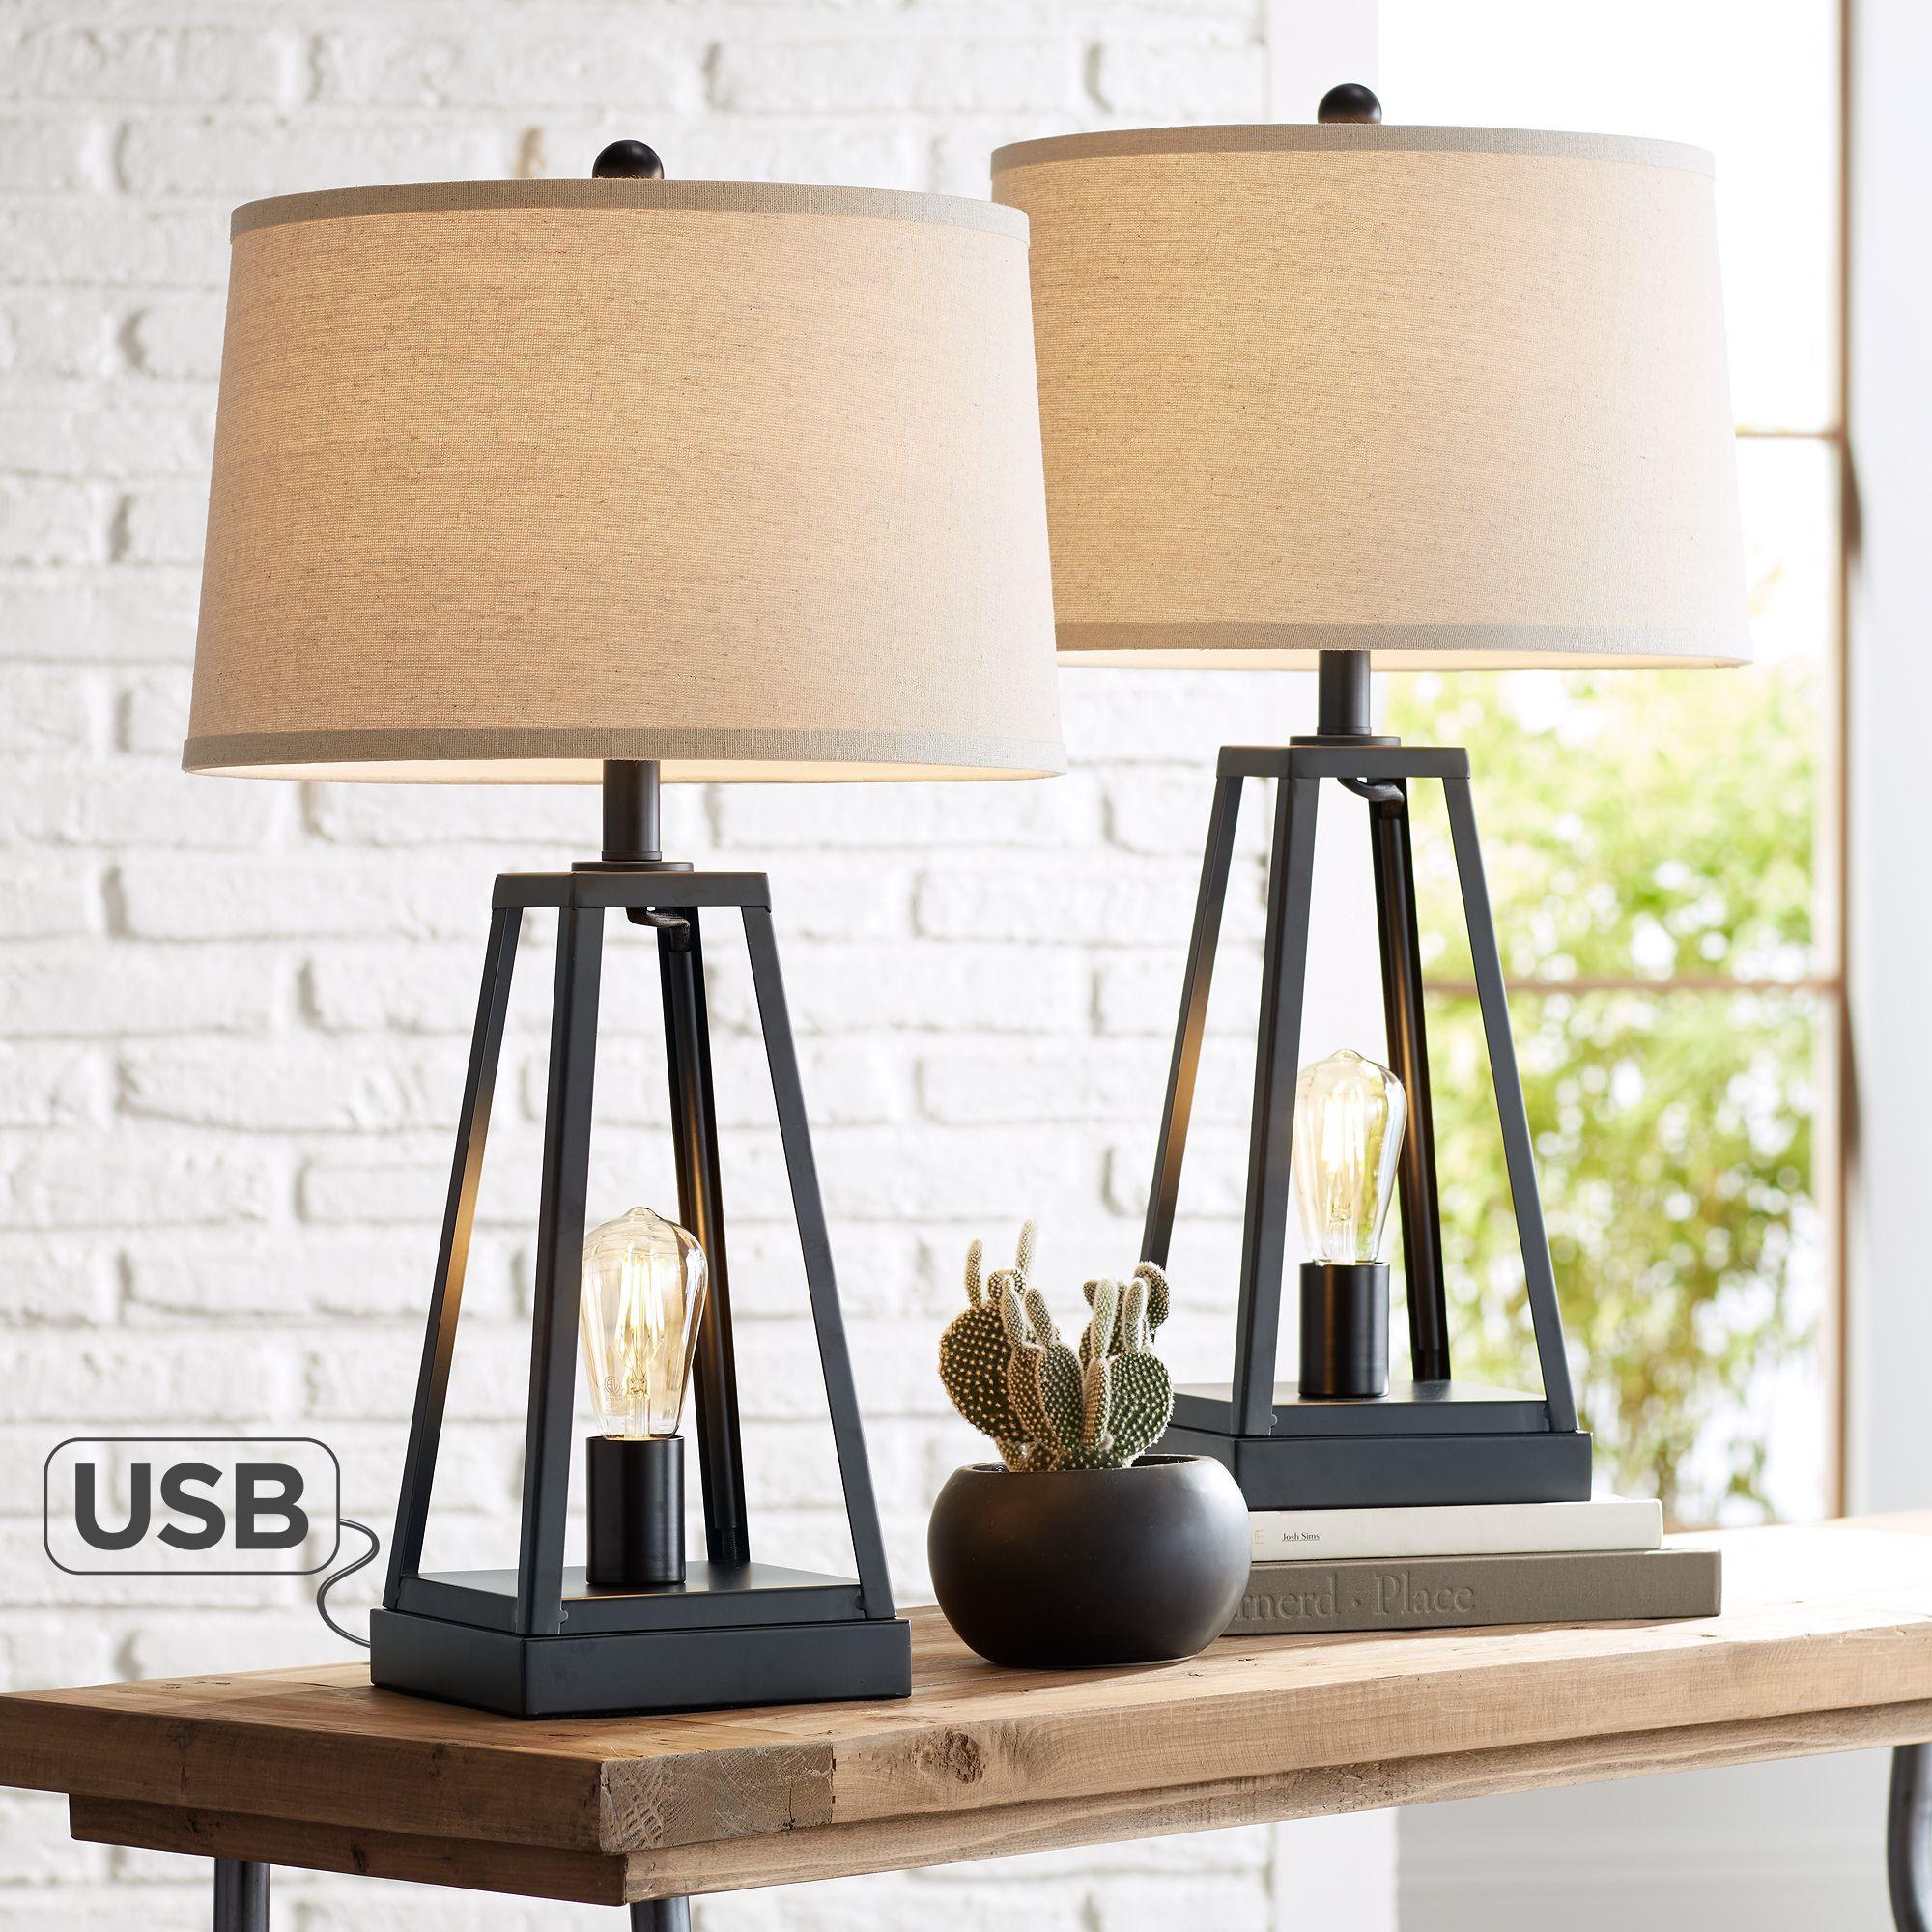 Kacey metal led night light usb table lamps set of 2